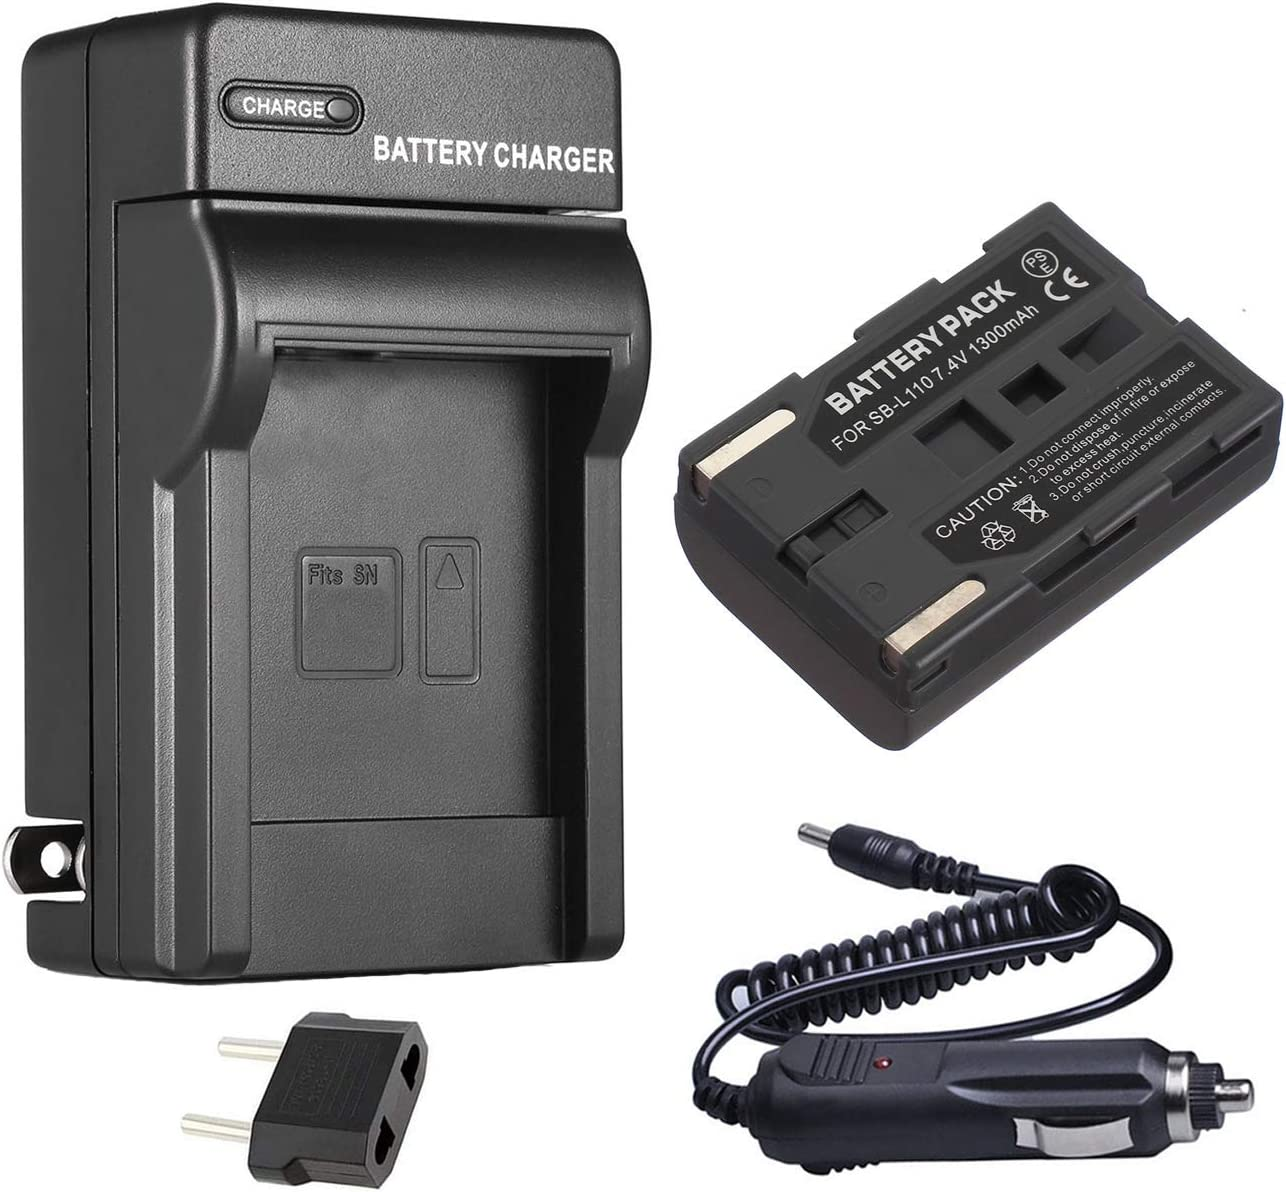 SC-D105 SC-D107 SC-D180 Digital Video Camcorder Battery Pack for Samsung SC-D101 SC-D103